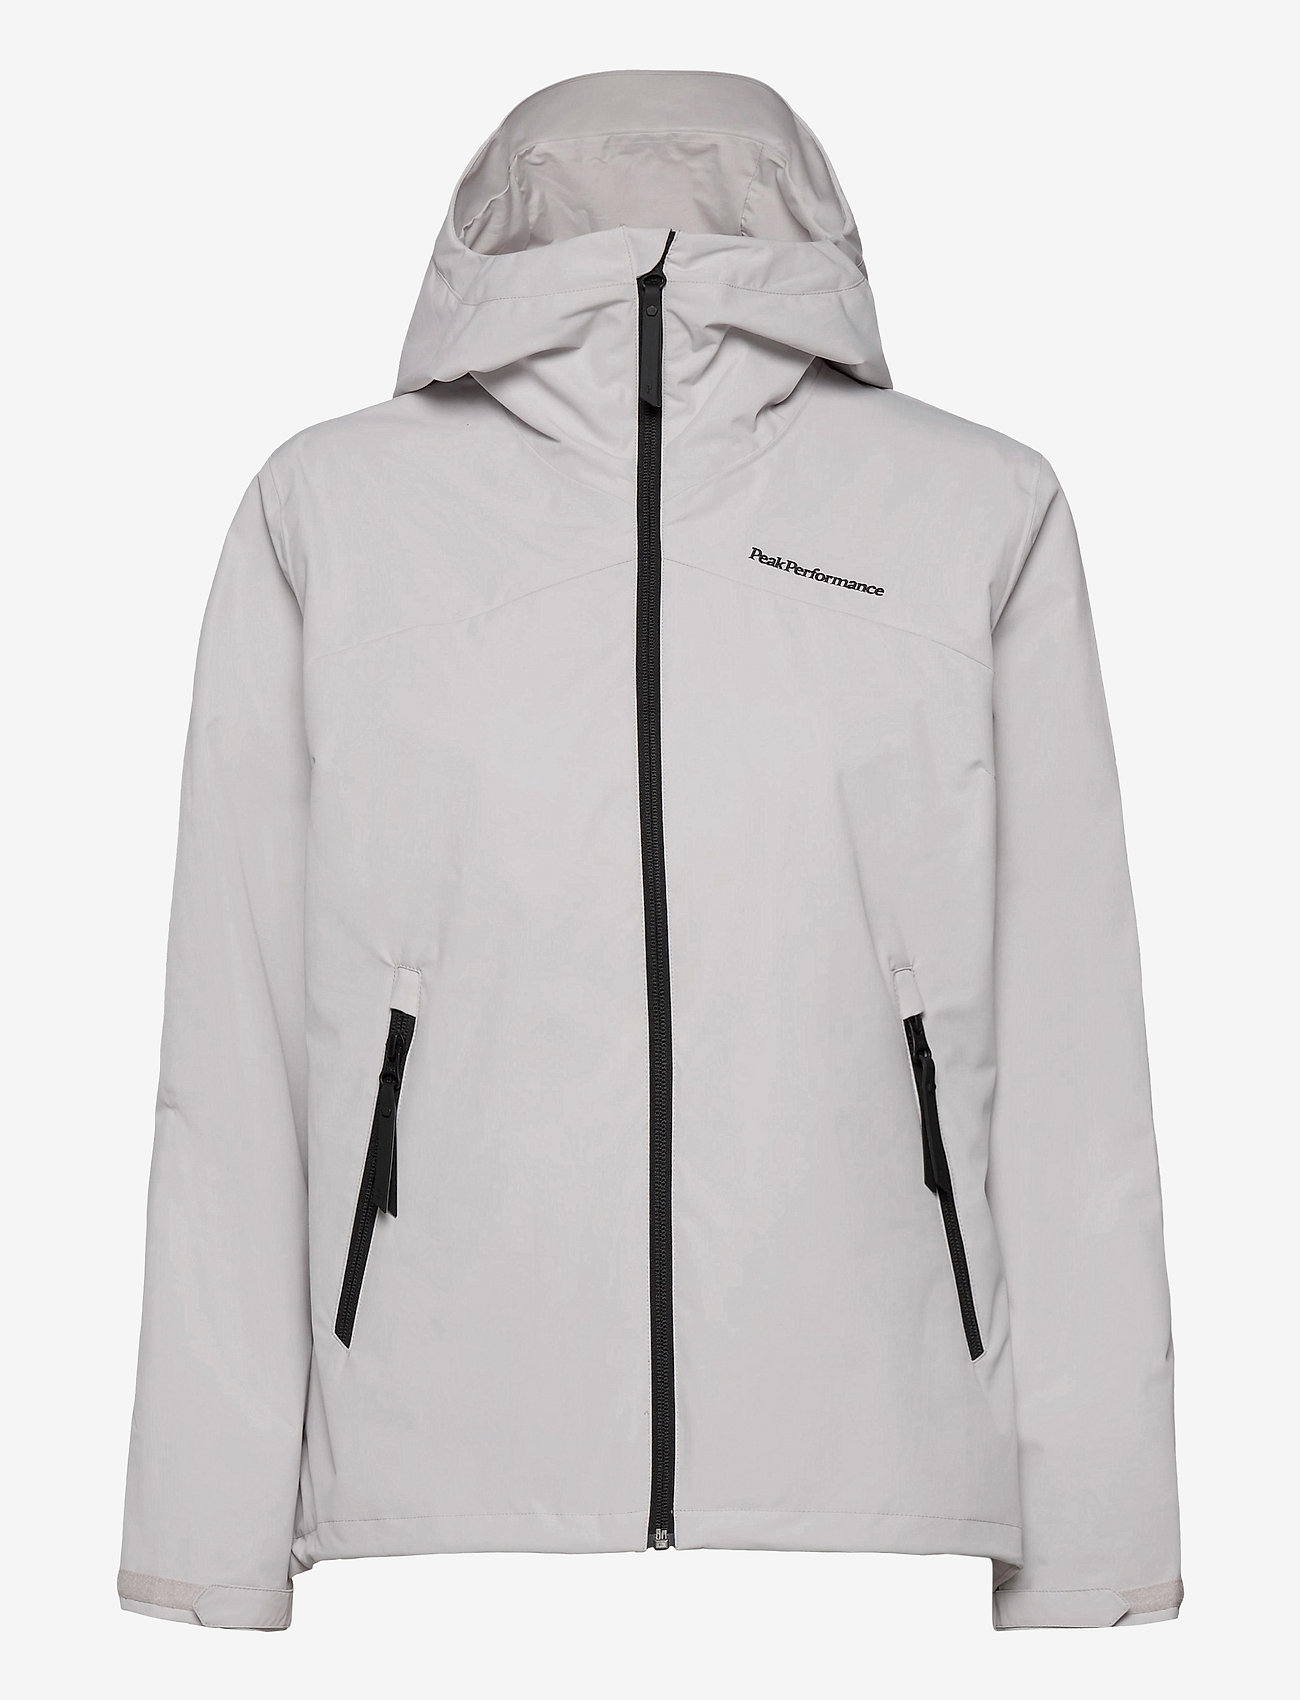 Peak Performance - W Coastal Jacket - ulkoilu- & sadetakit - antarctica - 0